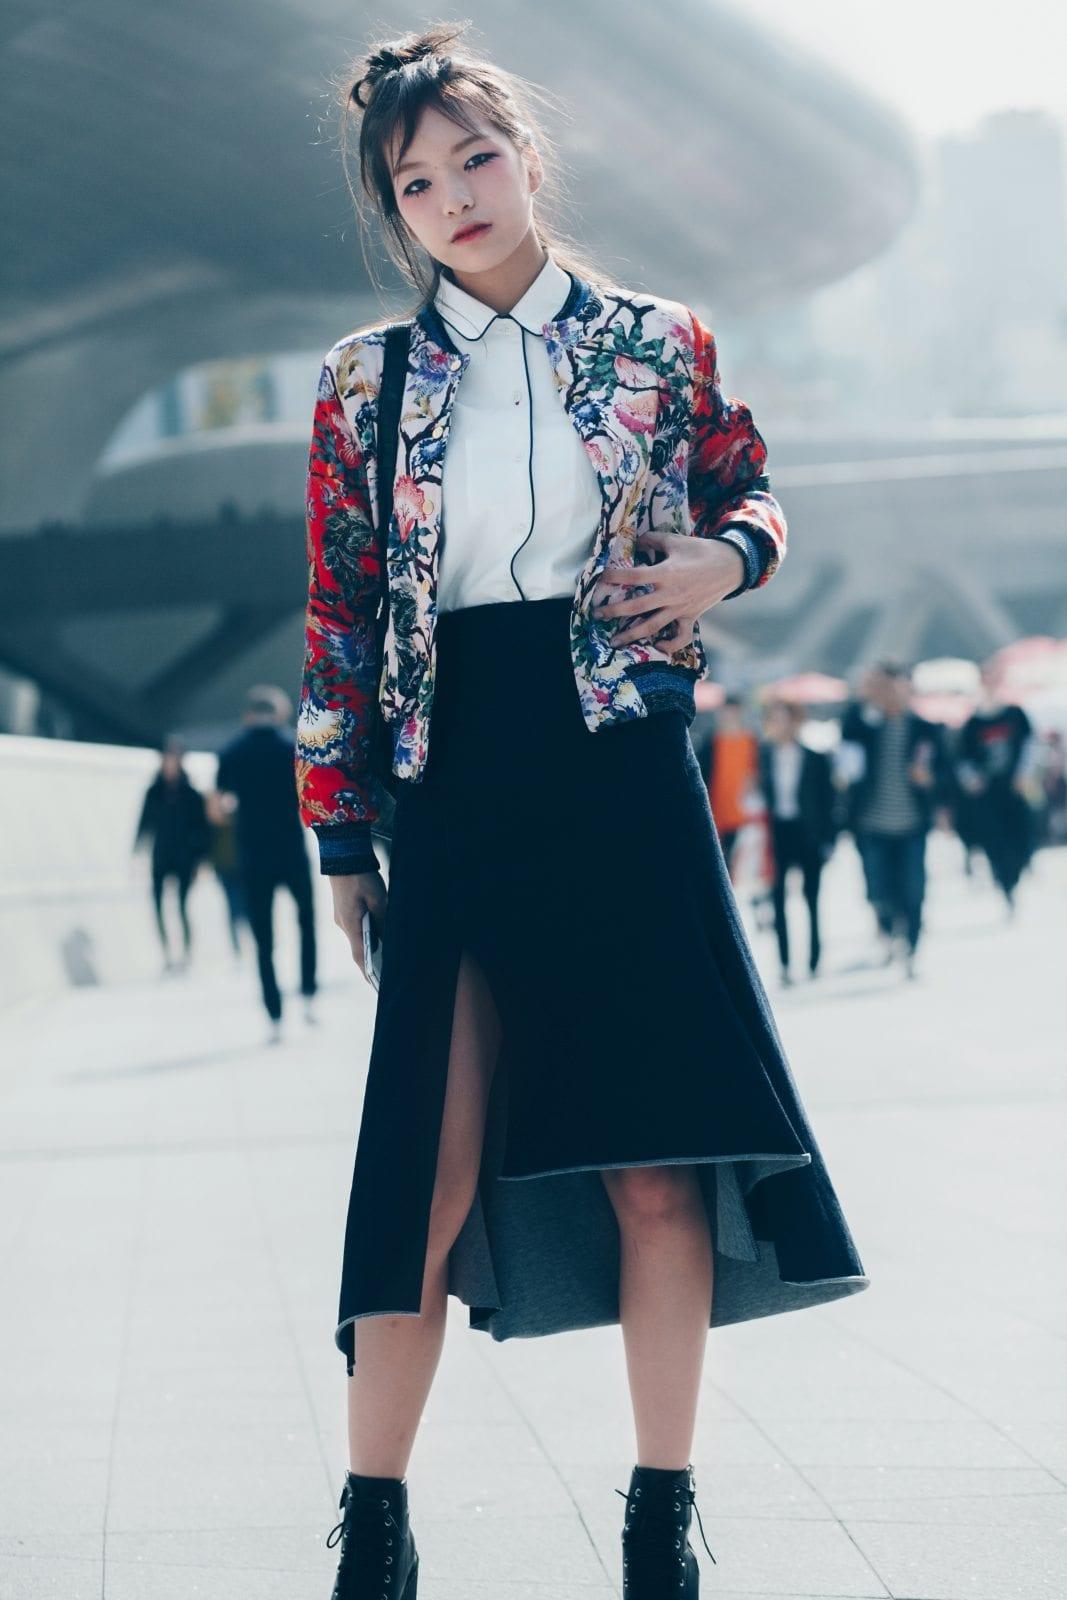 Seoul Fashion Week Shows Off Unique Styles 10 Magazine Korea